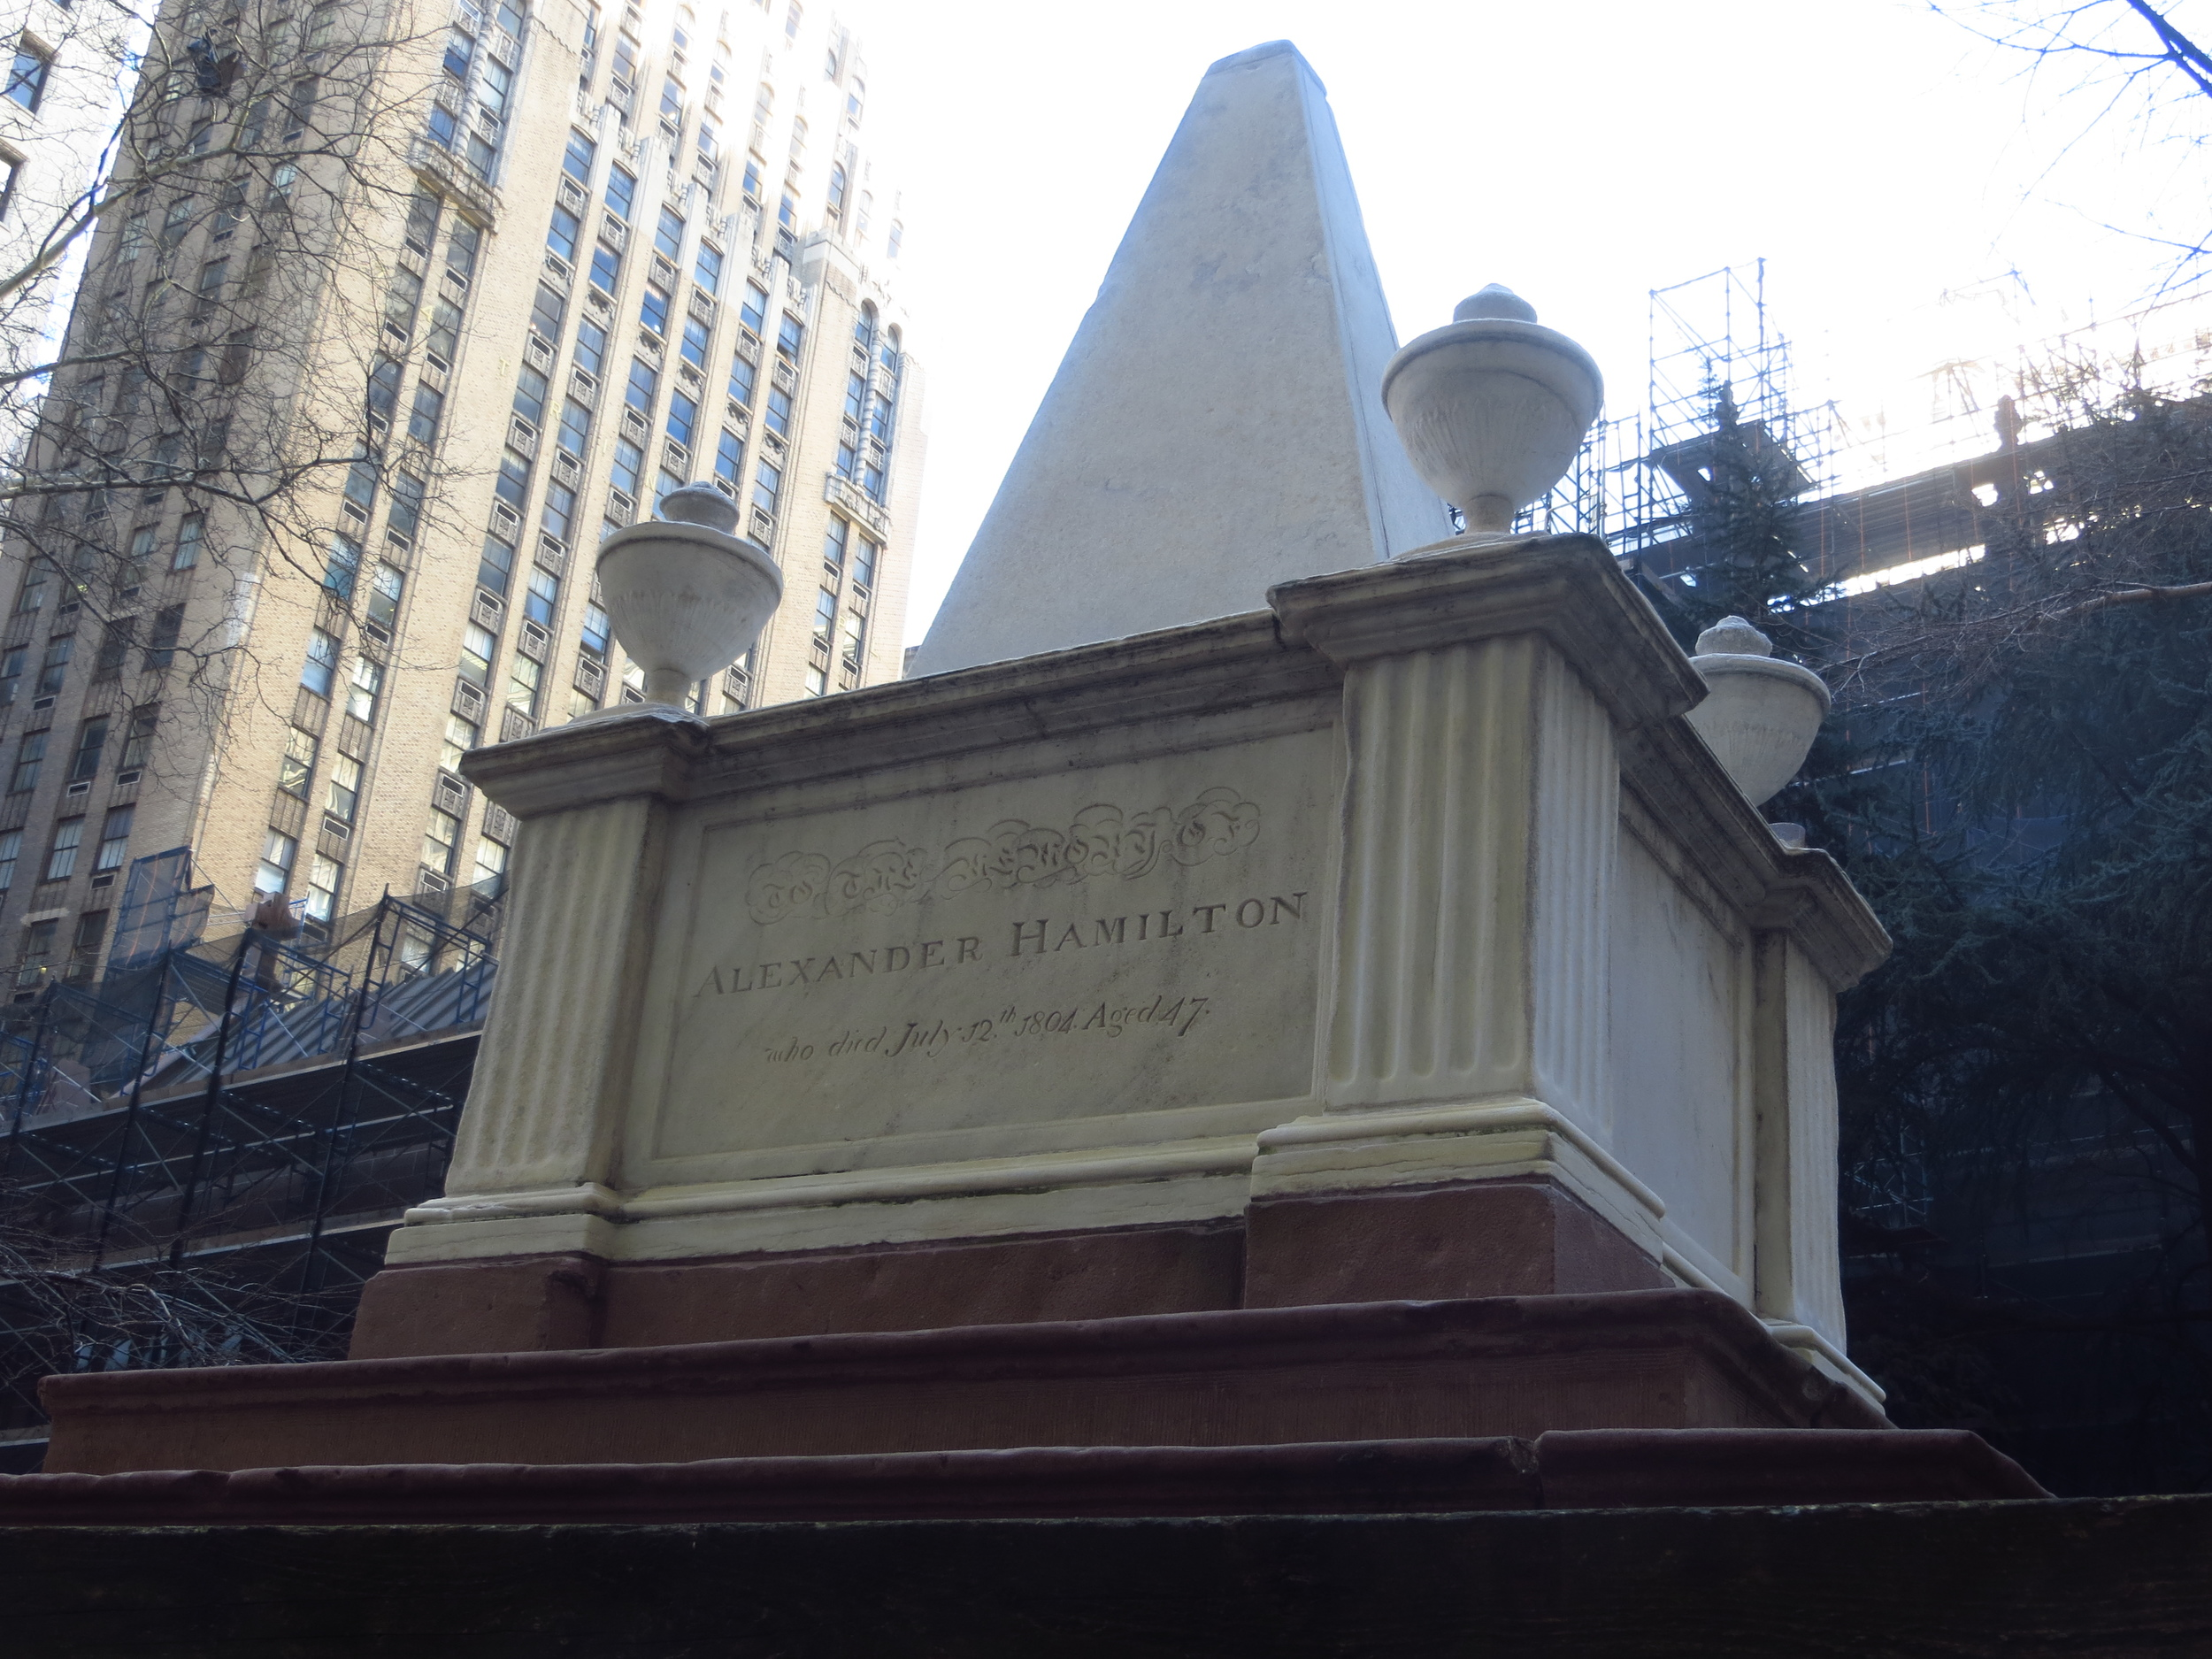 Tomb of Alexander Hamilton (1755-1804) in Trinity Churchyard